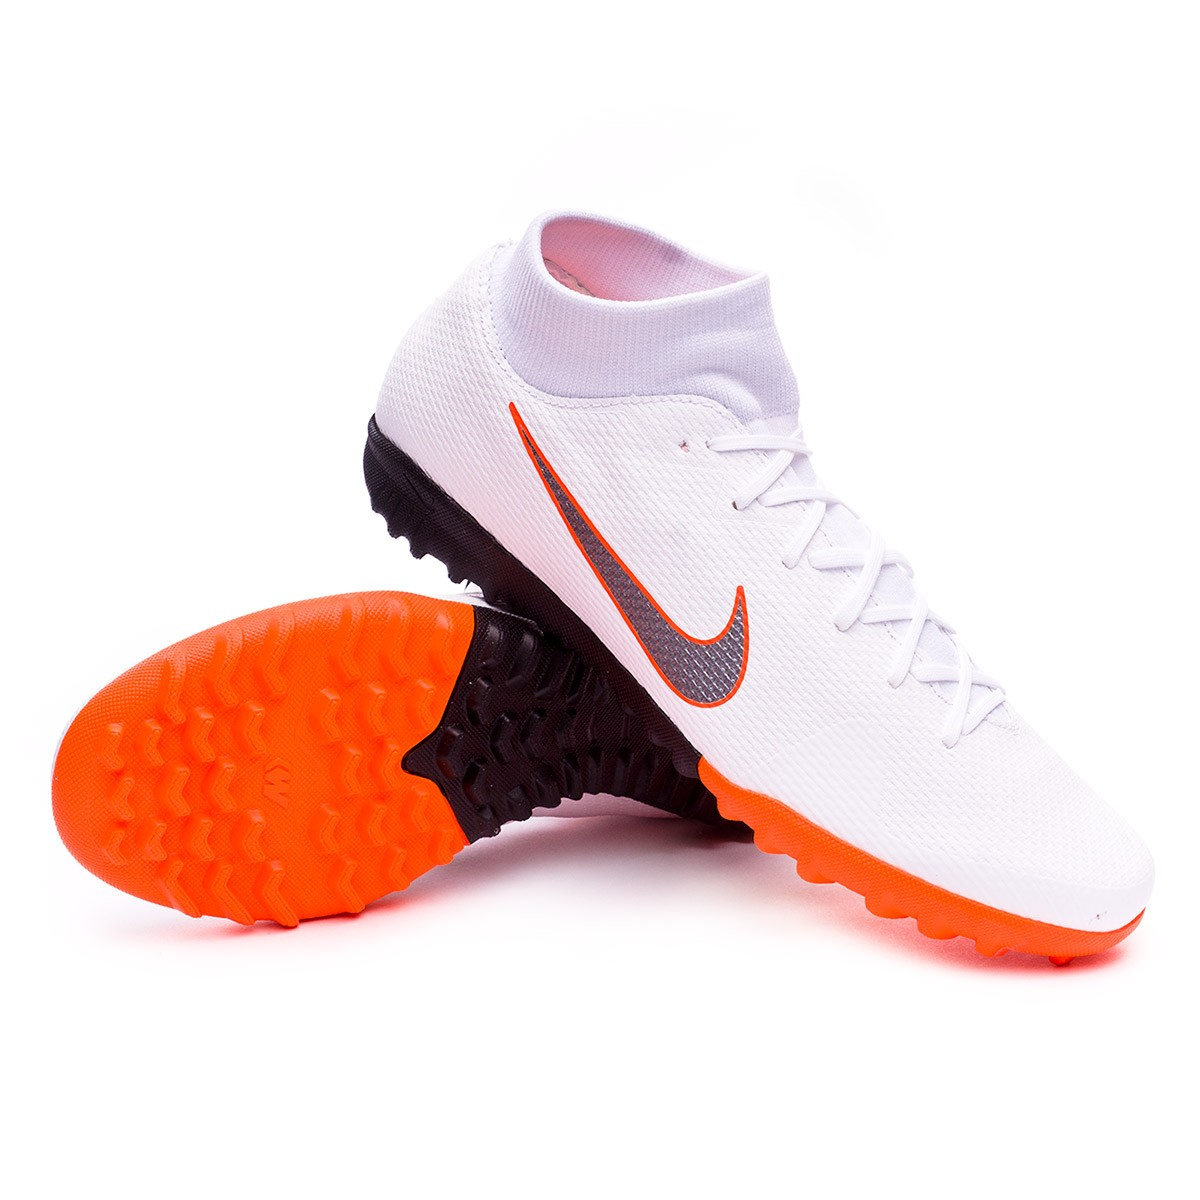 Football Boot Nike Mercurial SuperflyX VI Academy Turf White ... 4a9306e14d6a7